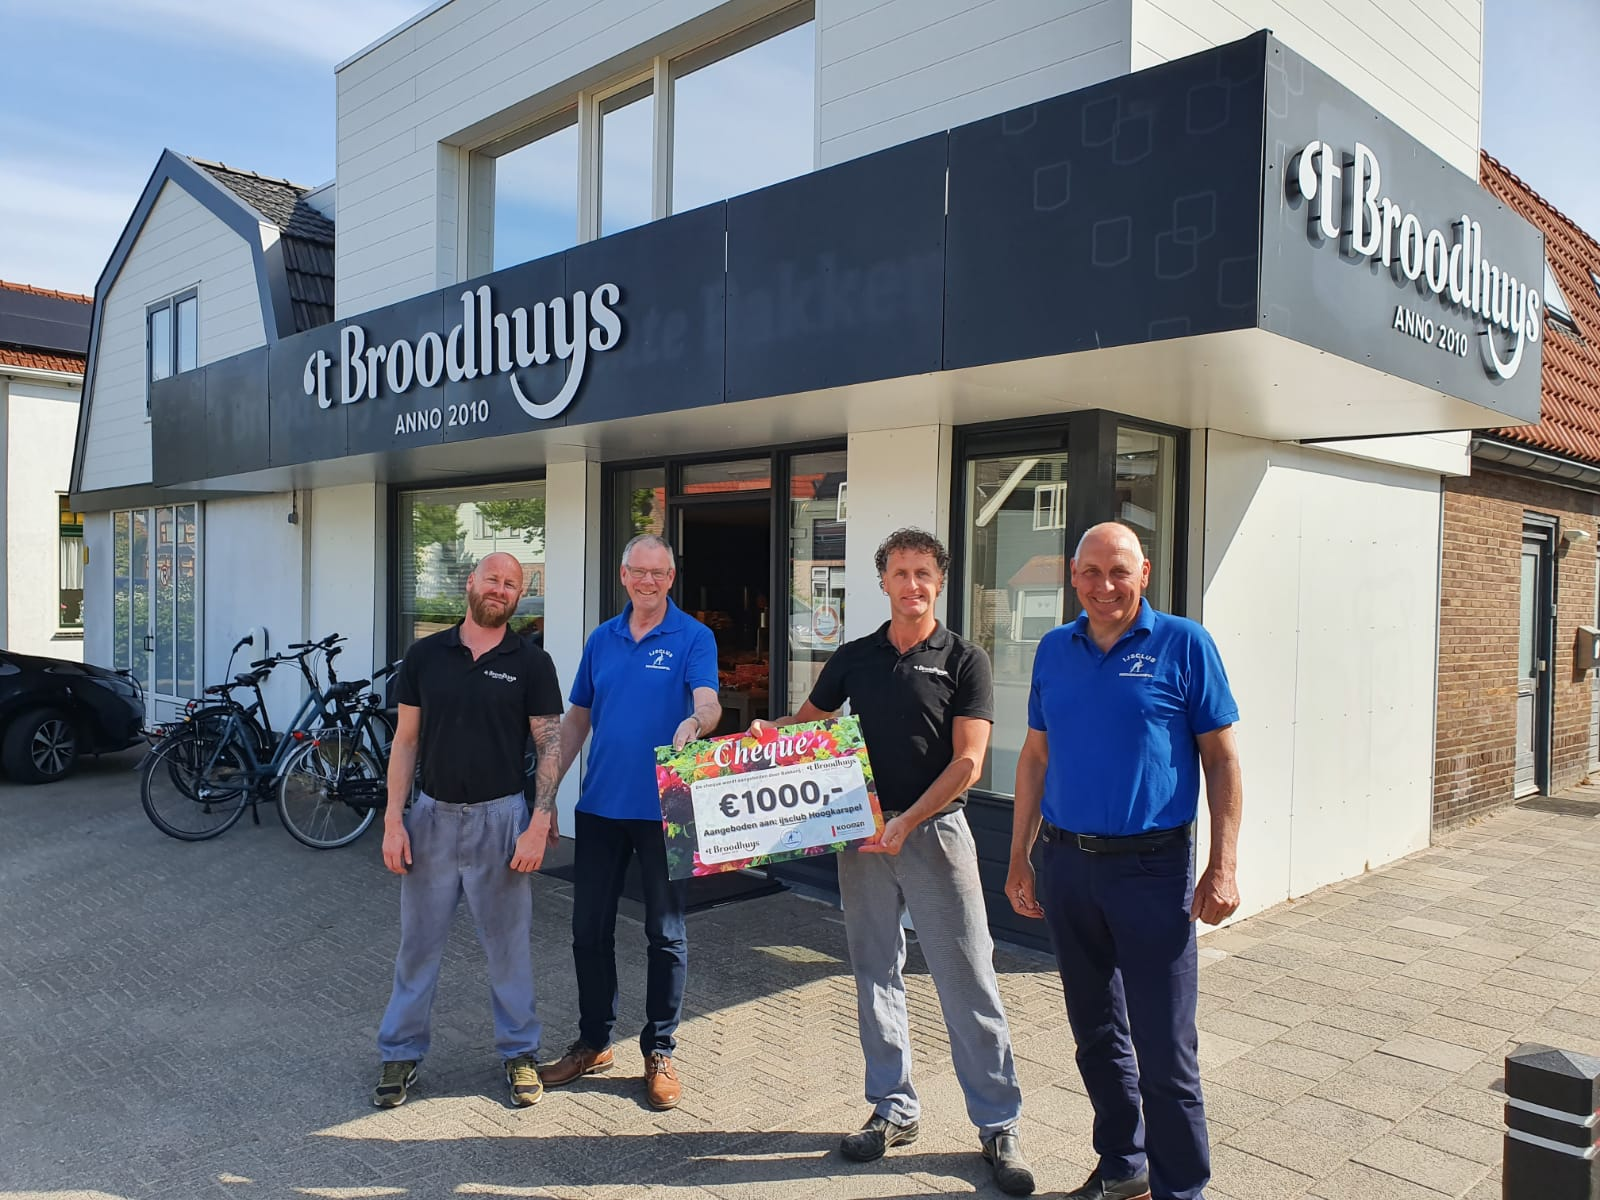 Uitreiking Cheque Koningsdag Actie 't Broodhuys